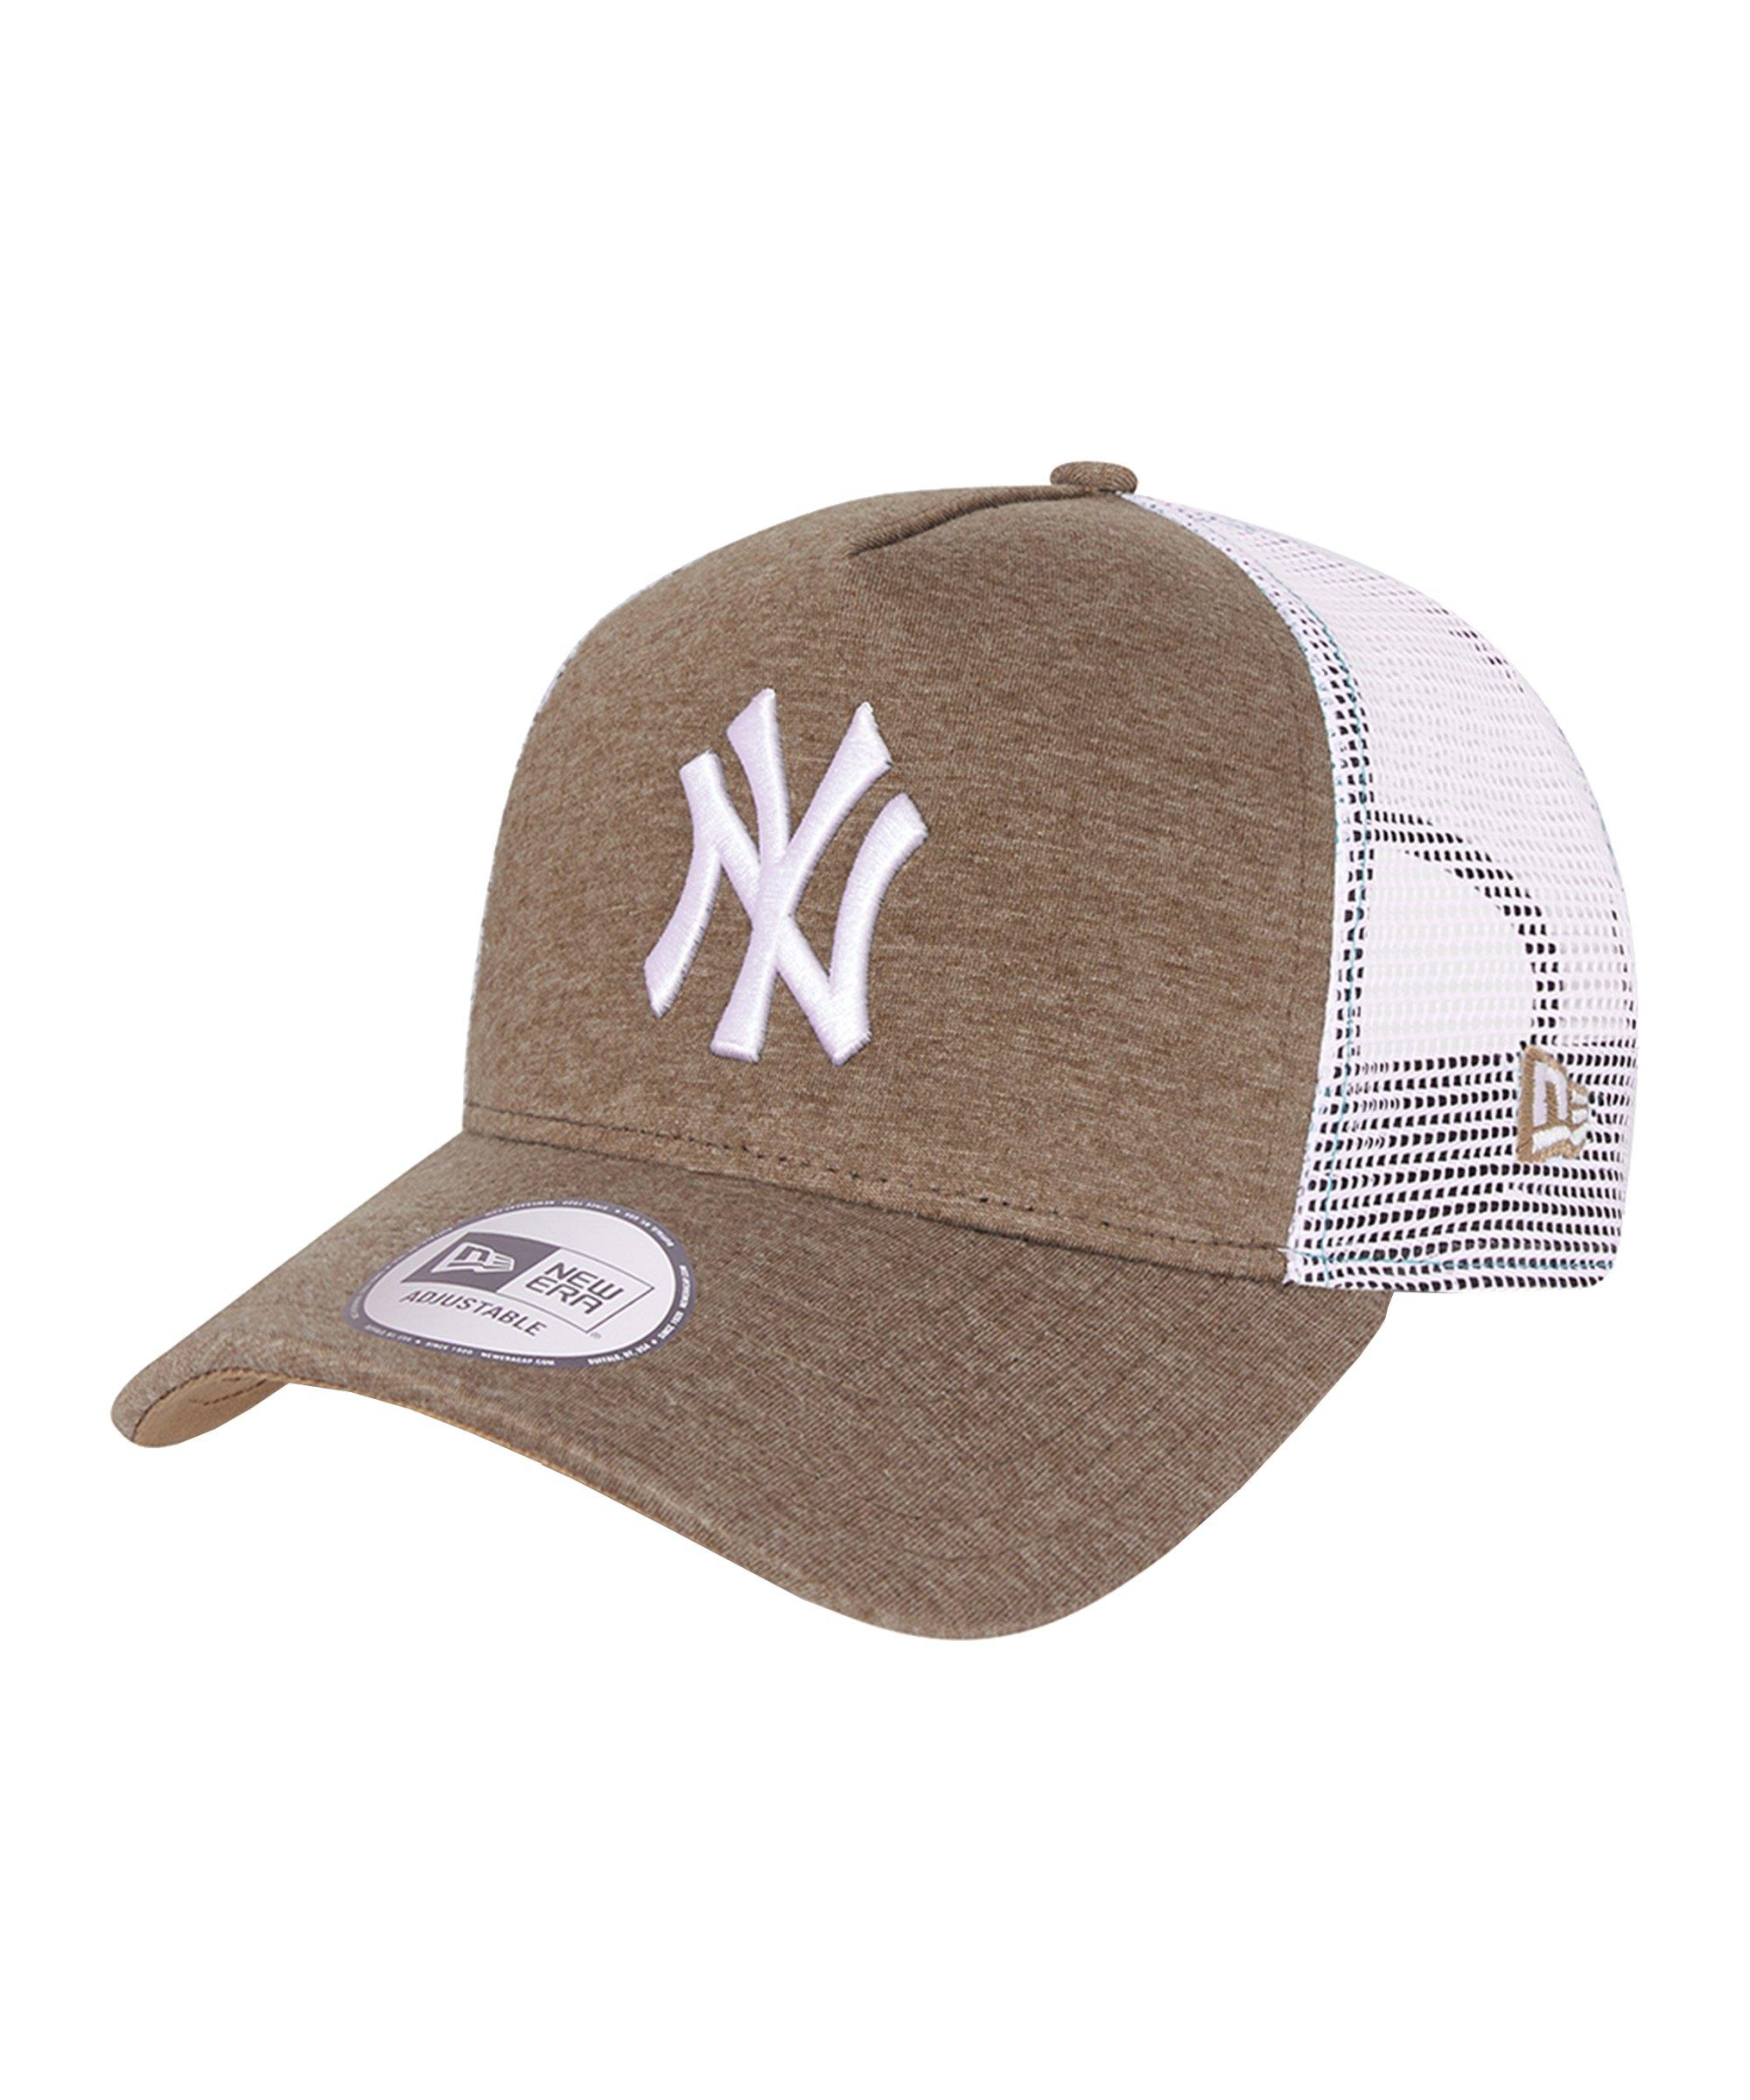 New Era NY Yankees Jersey Trucker Cap Braun FWHT - braun